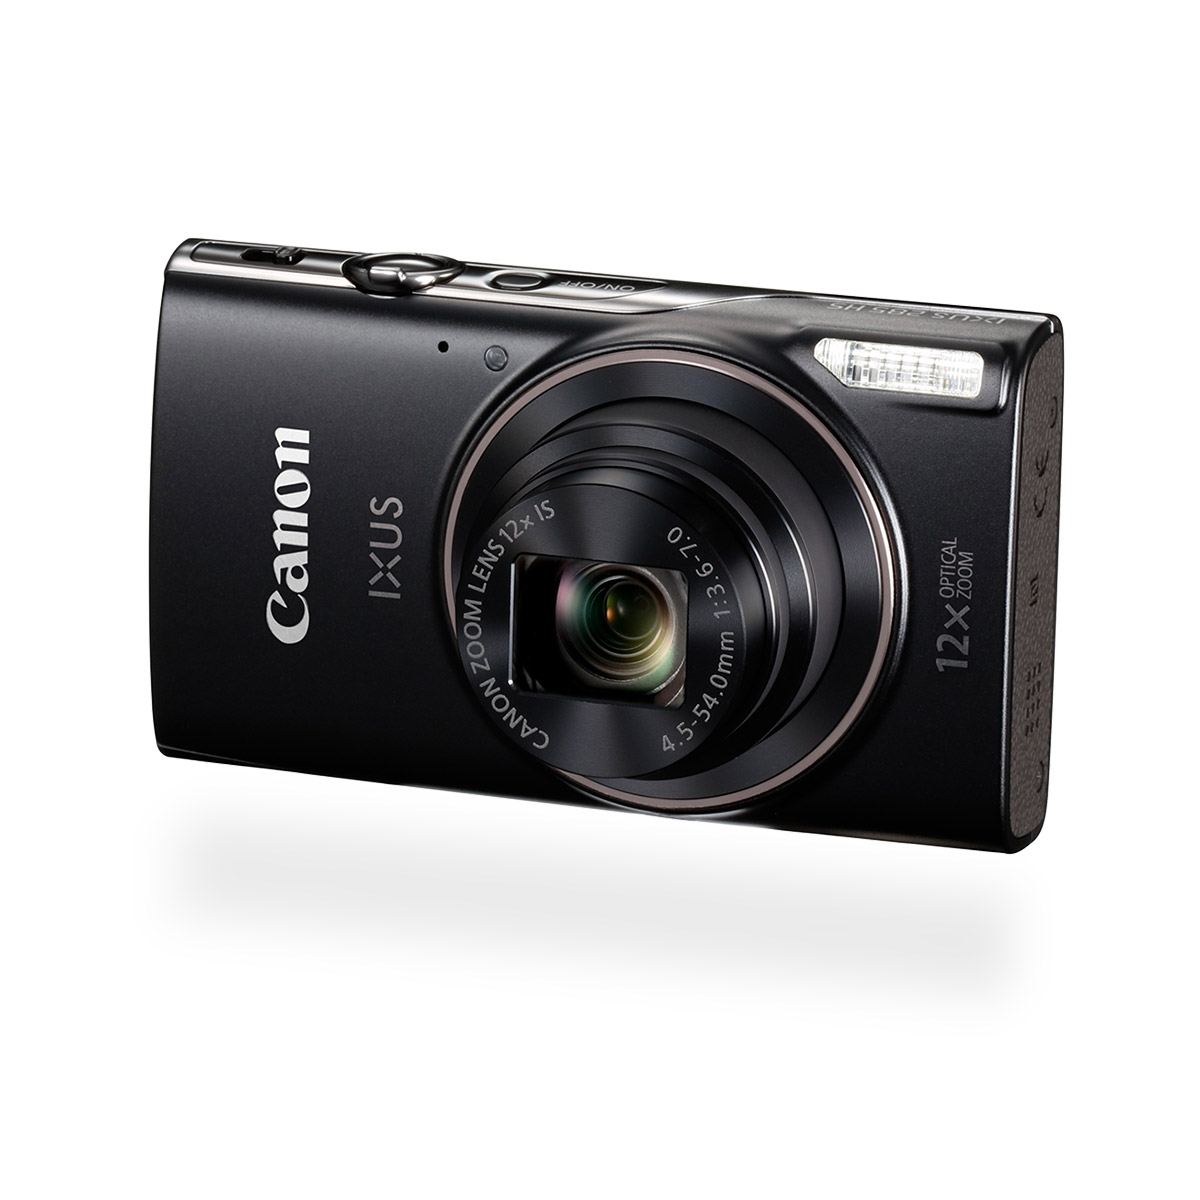 Canon IXUS 285 HS digital compact camera black front angled